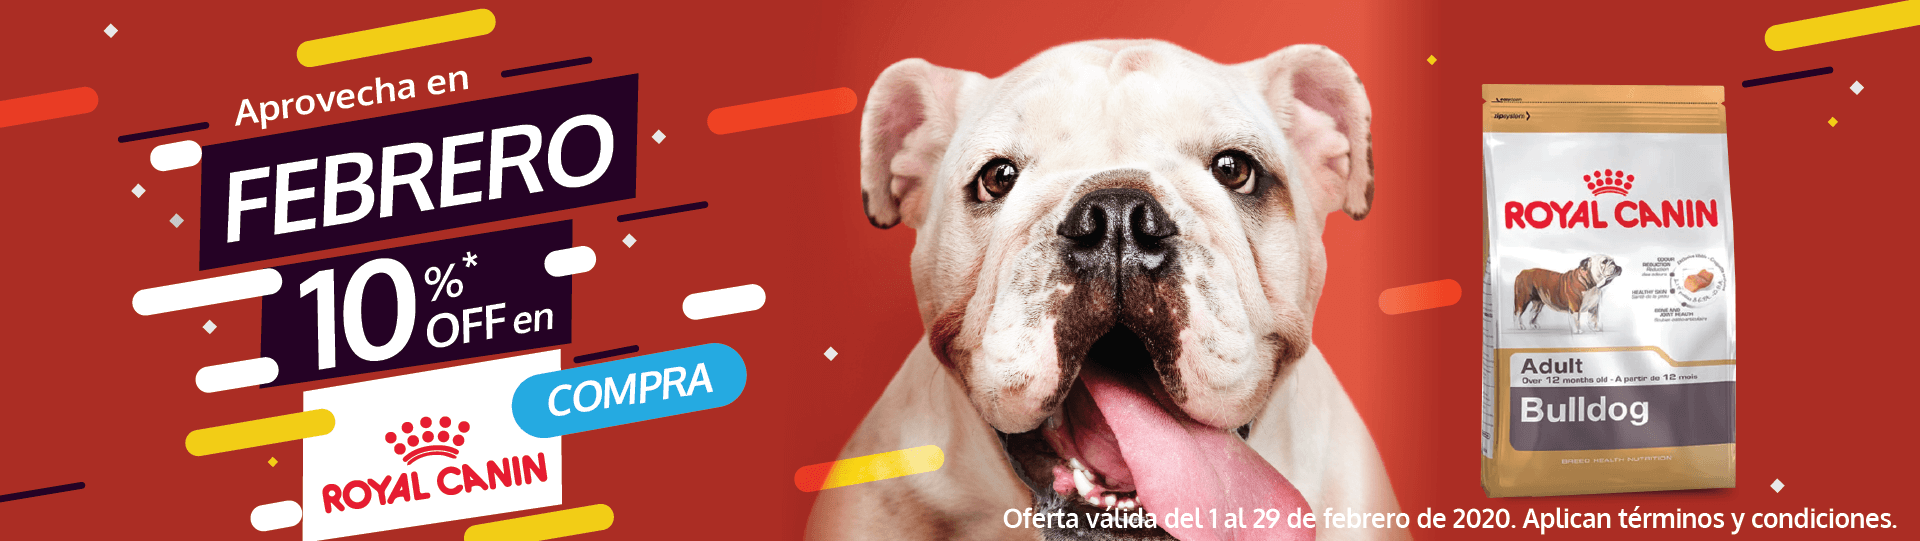 ROYAL CANIN OFERTA - Comida para perros Agrocampo